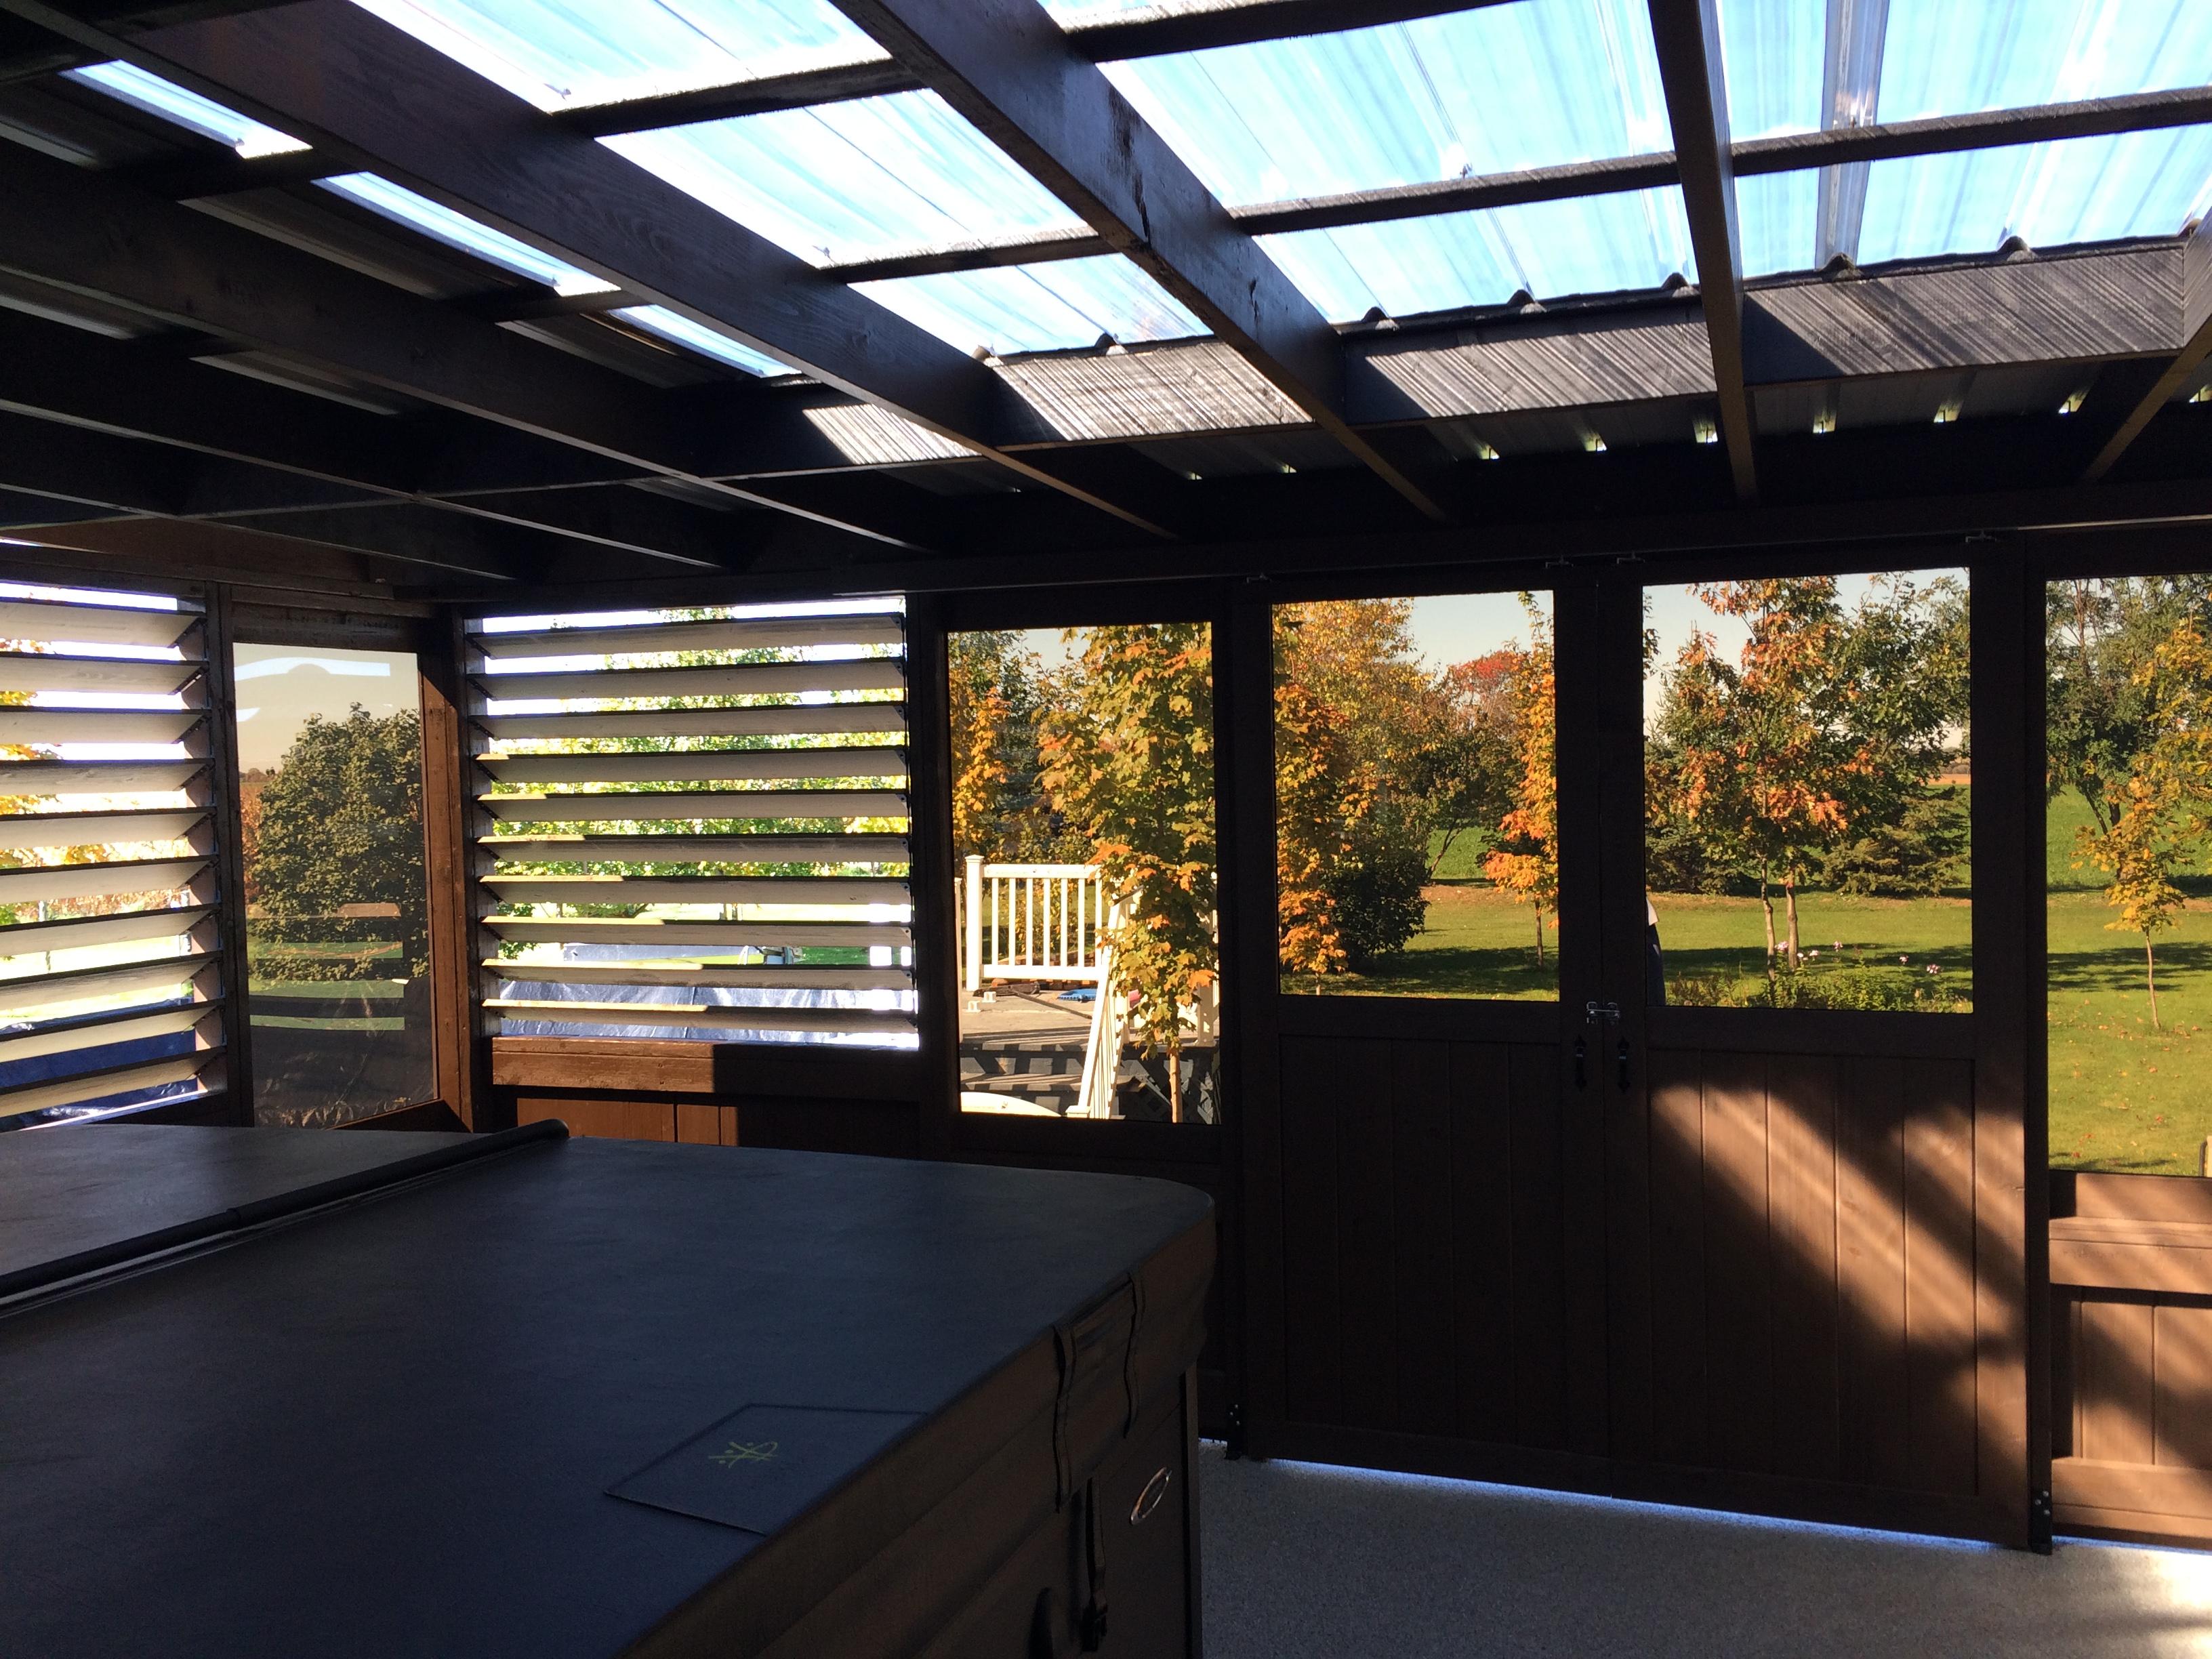 abri soleil un versant pour patio de Gazebo Pic-Bois